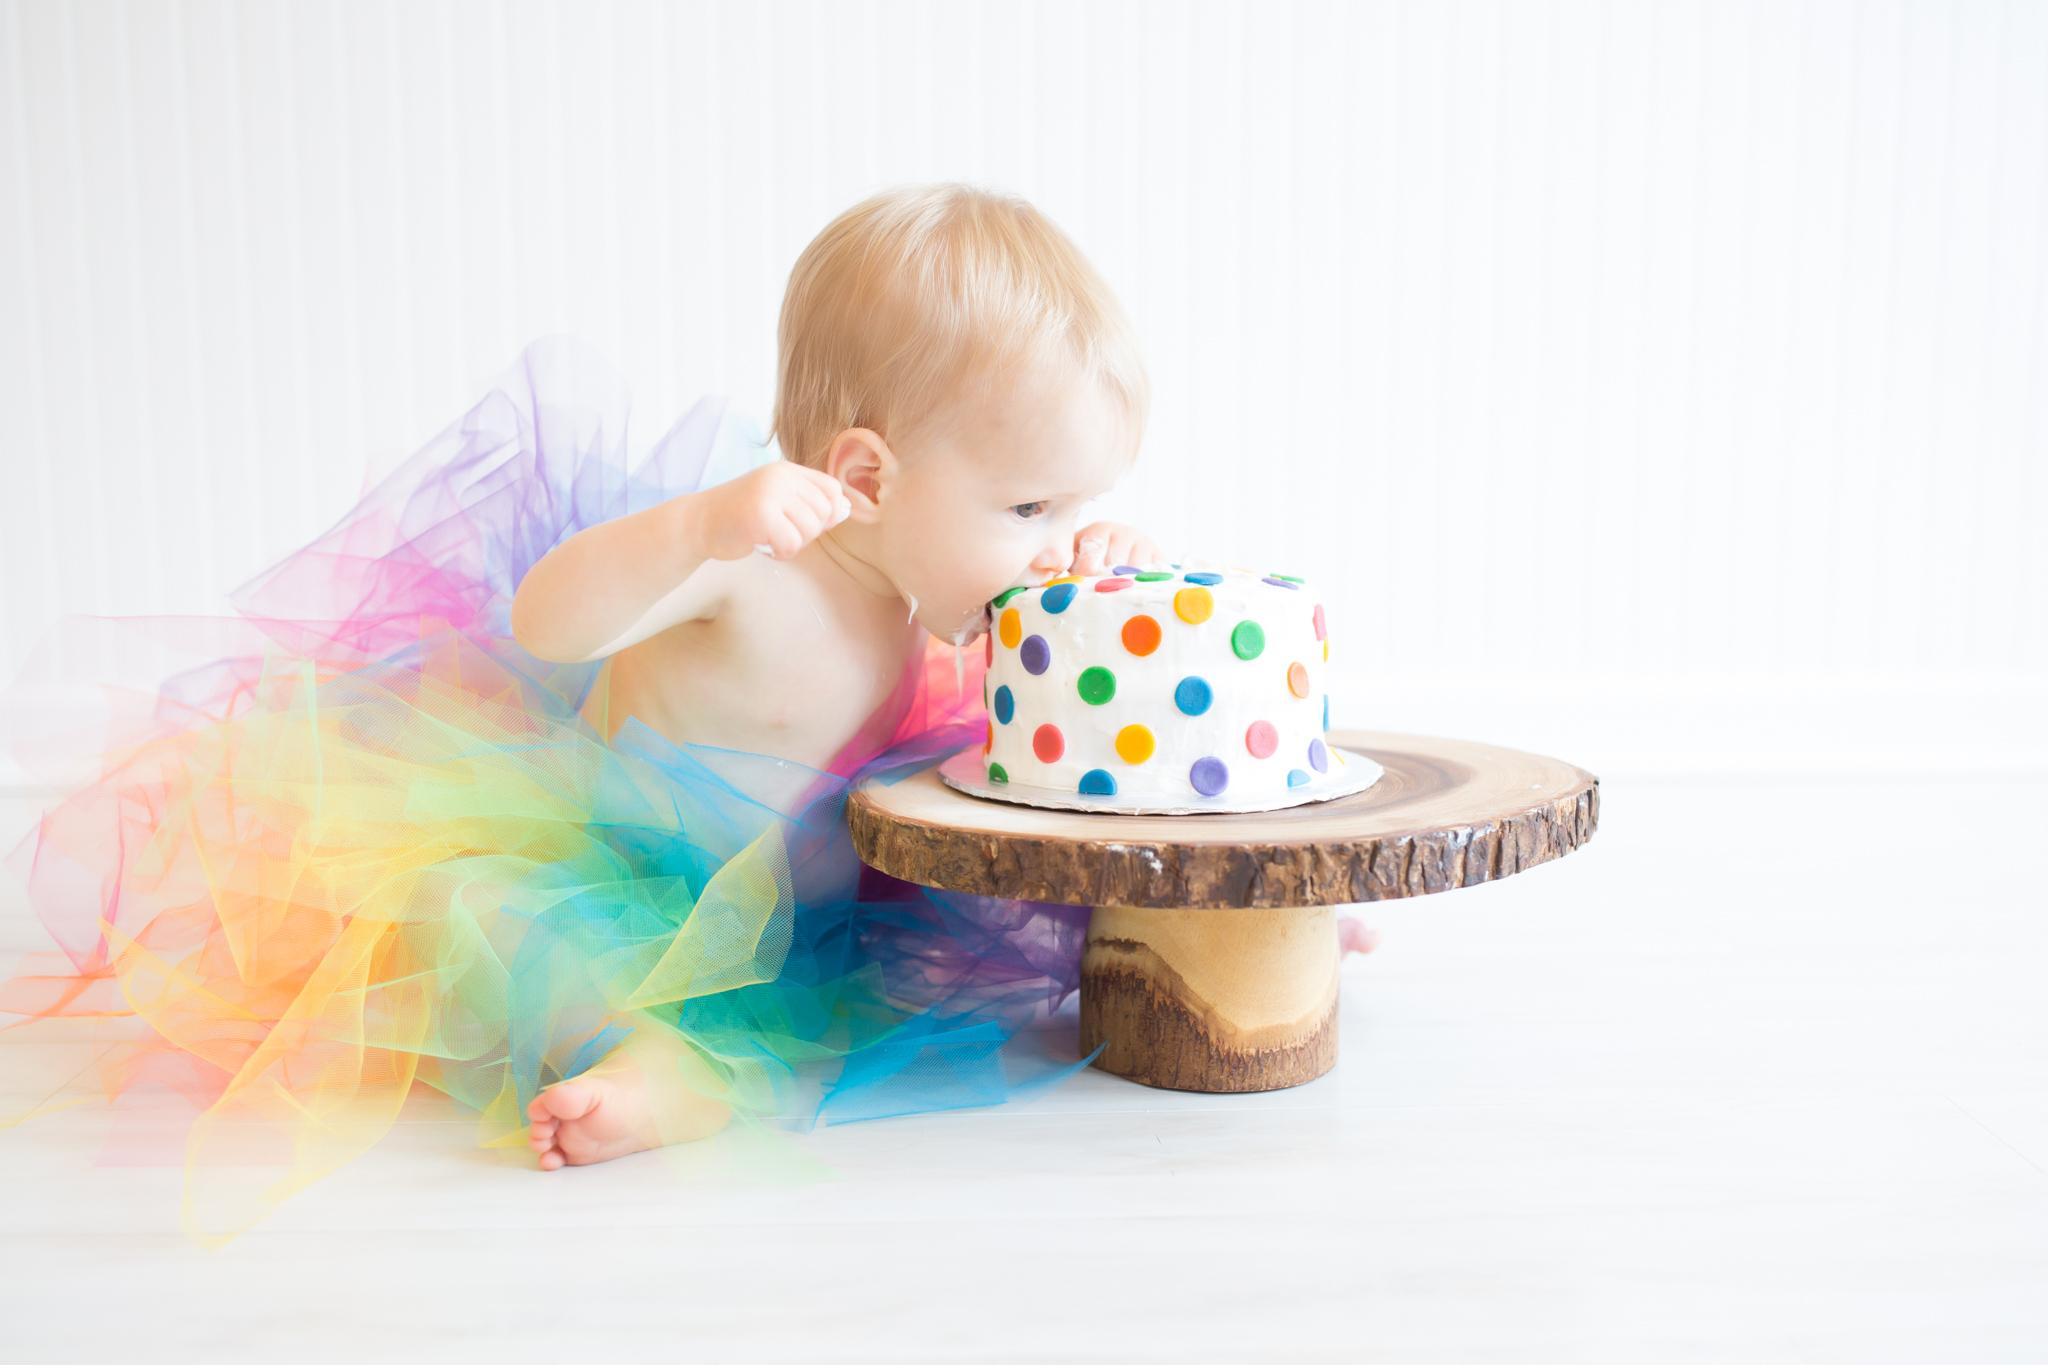 Milestone cake smash Newborn Studio Session | Cara Peterson Photography Rockford IL-12.jpg